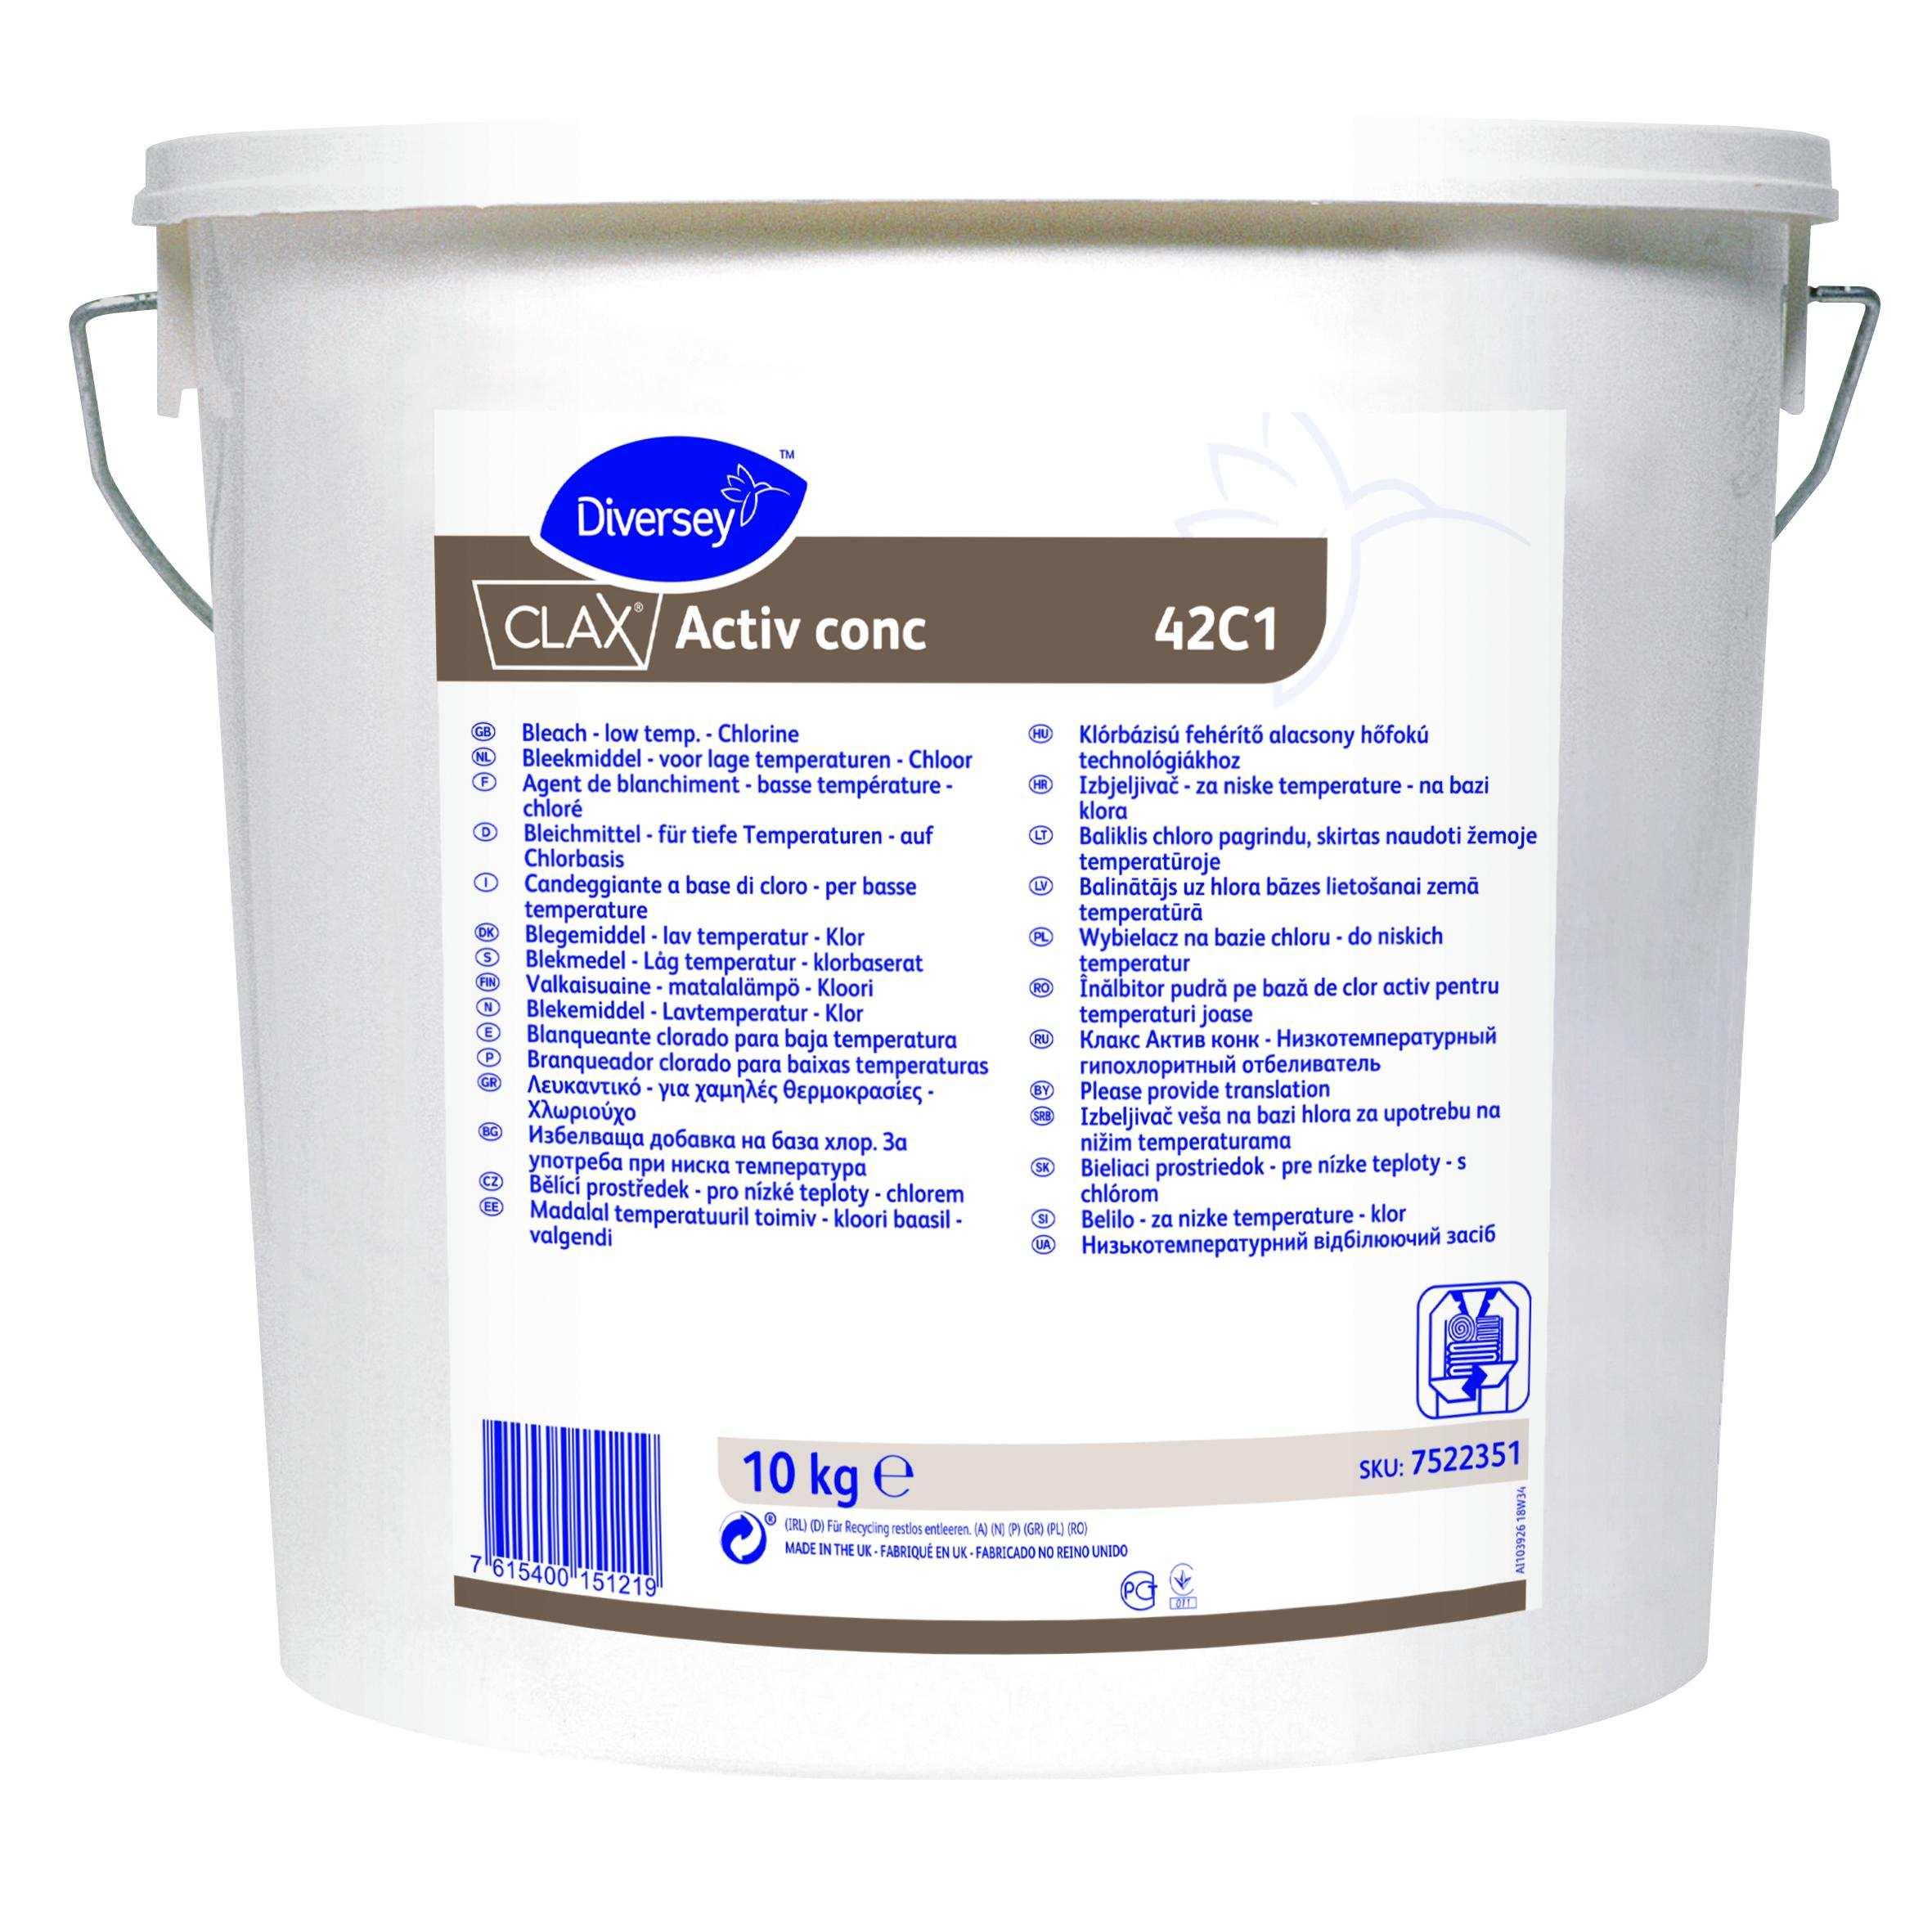 7522351-Clax-Activ-conc-42C1-10kg-CMYK-20x20cm.jpg